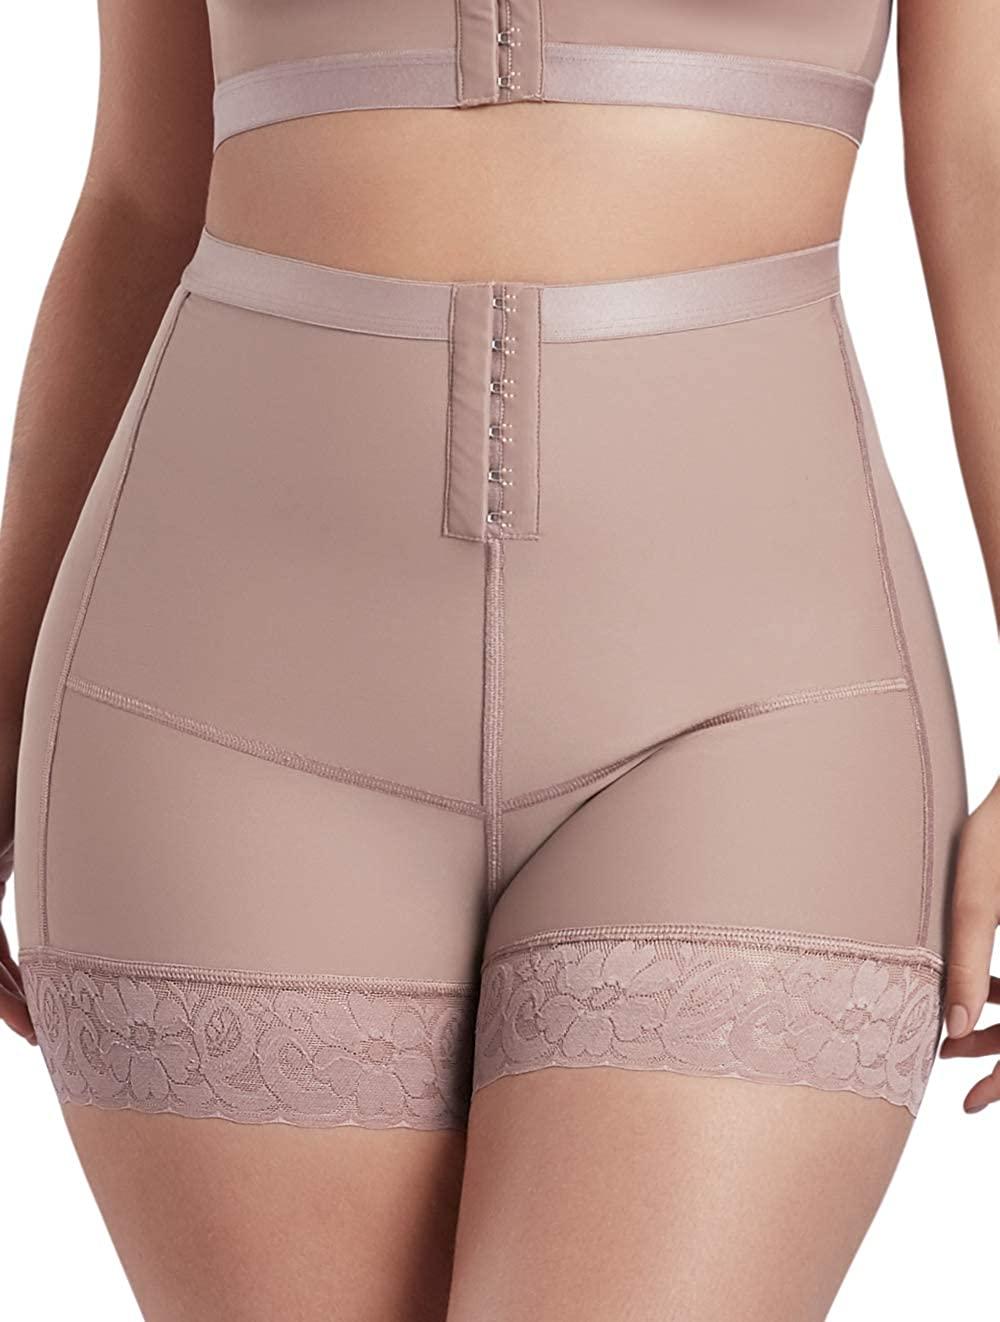 CURVEEZ Post Surgery Hourglass Butt Lifter Shaper Panties Tummy Control High Waisted Bodyshort